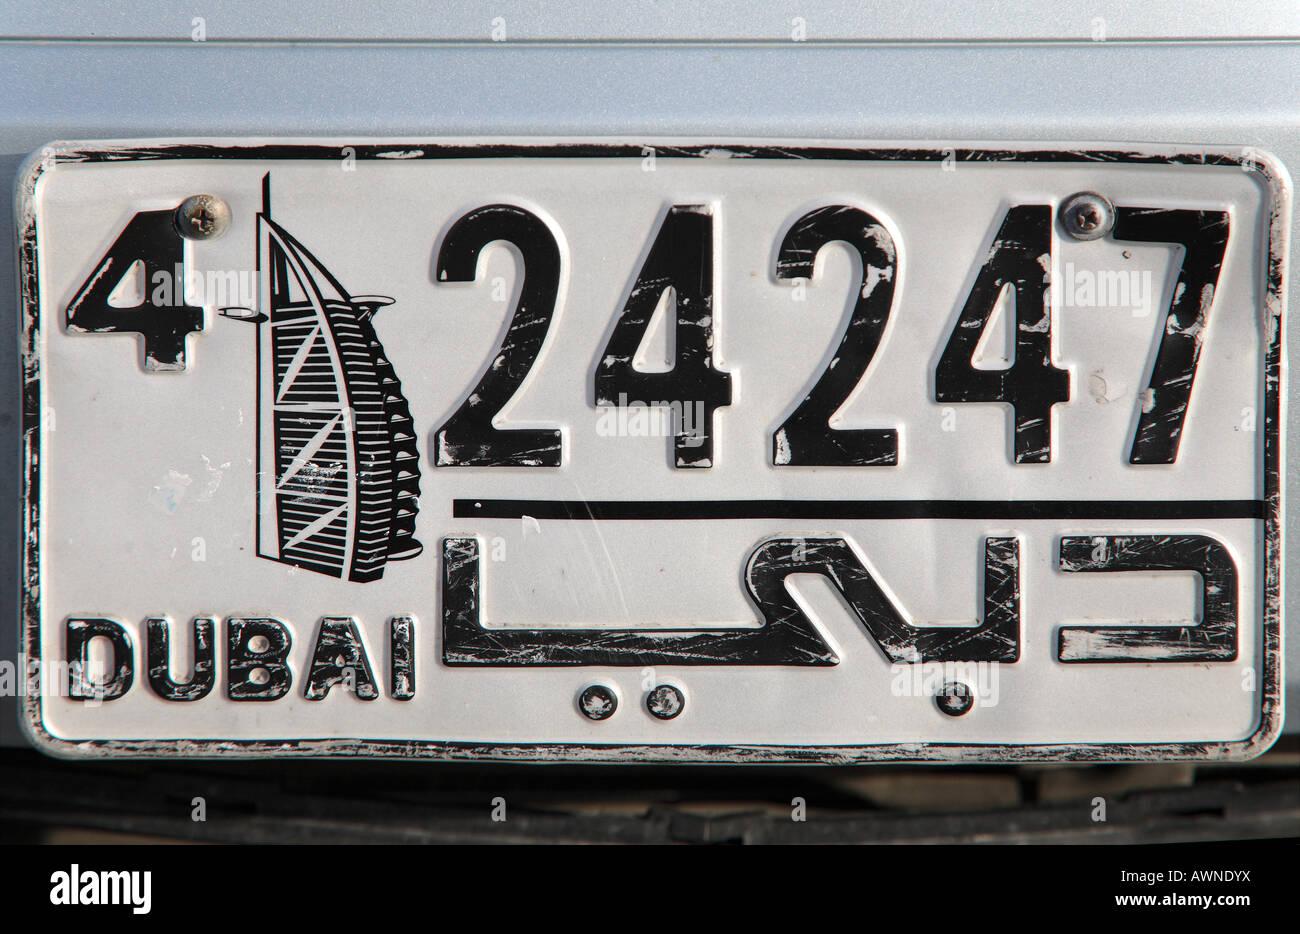 Dubai Number Plate With Burj Al Arab Stock Photo 16622365